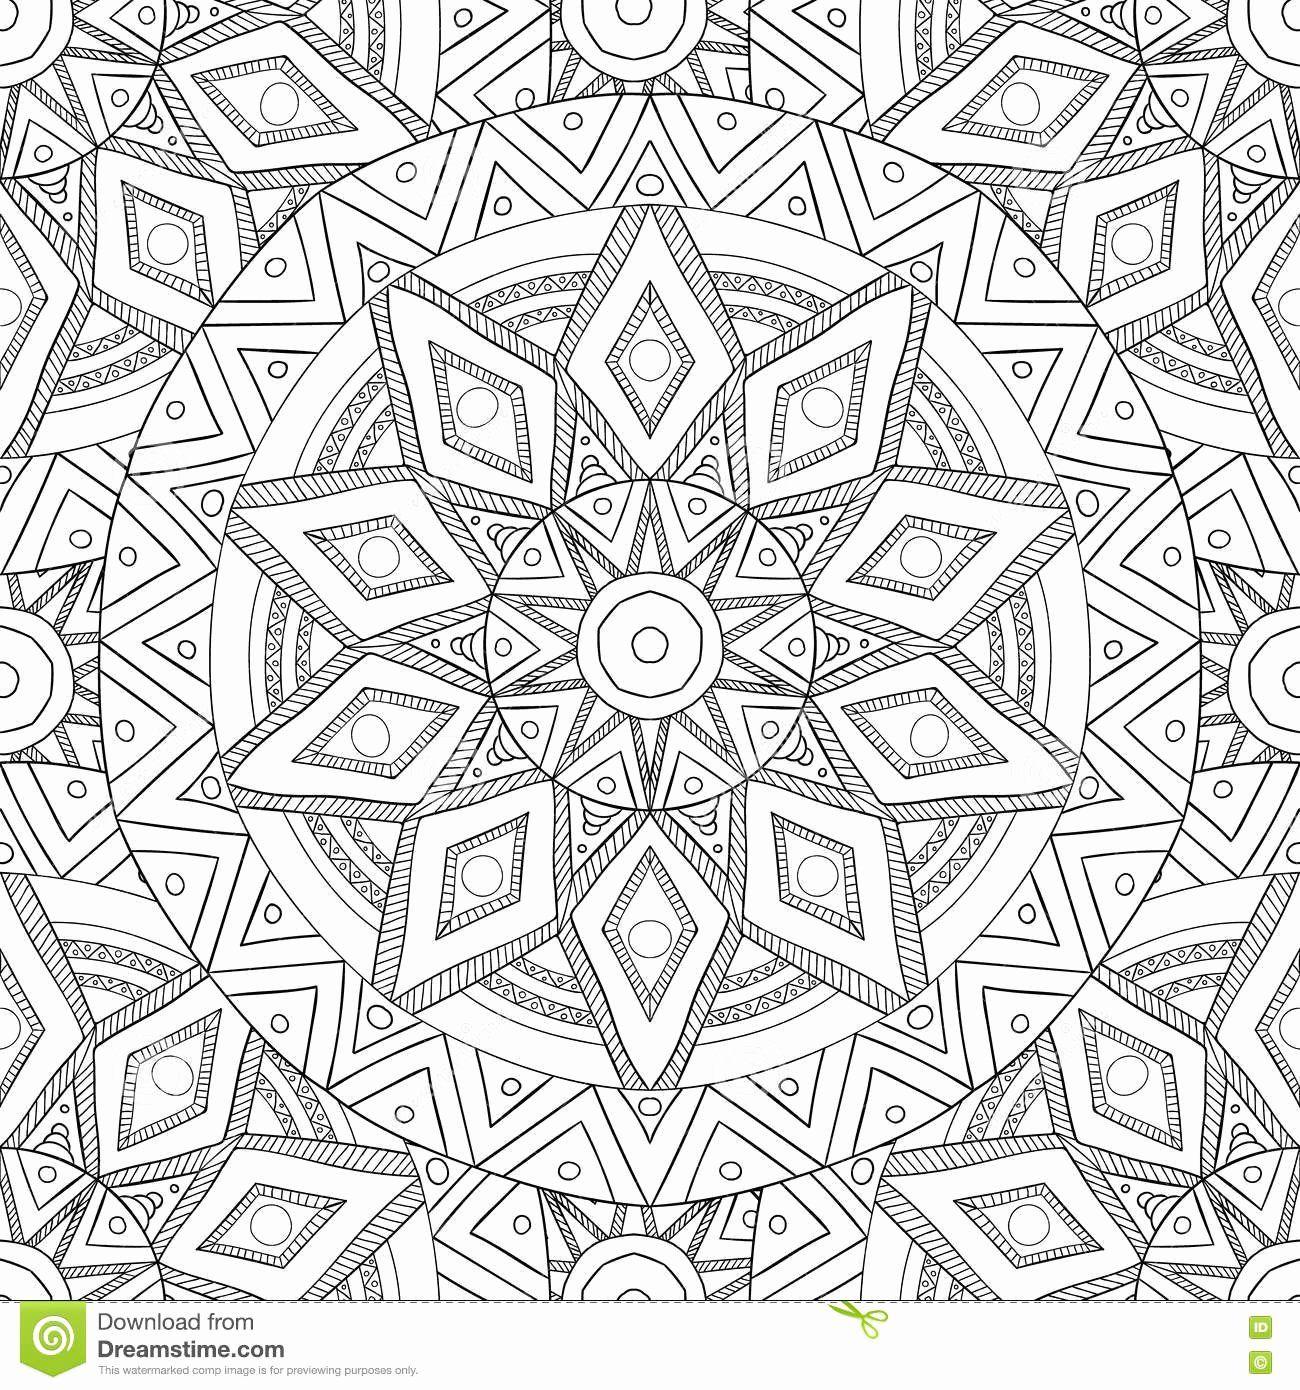 Nature Mandala Coloring Pages Printable In 2020 Mandala Coloring